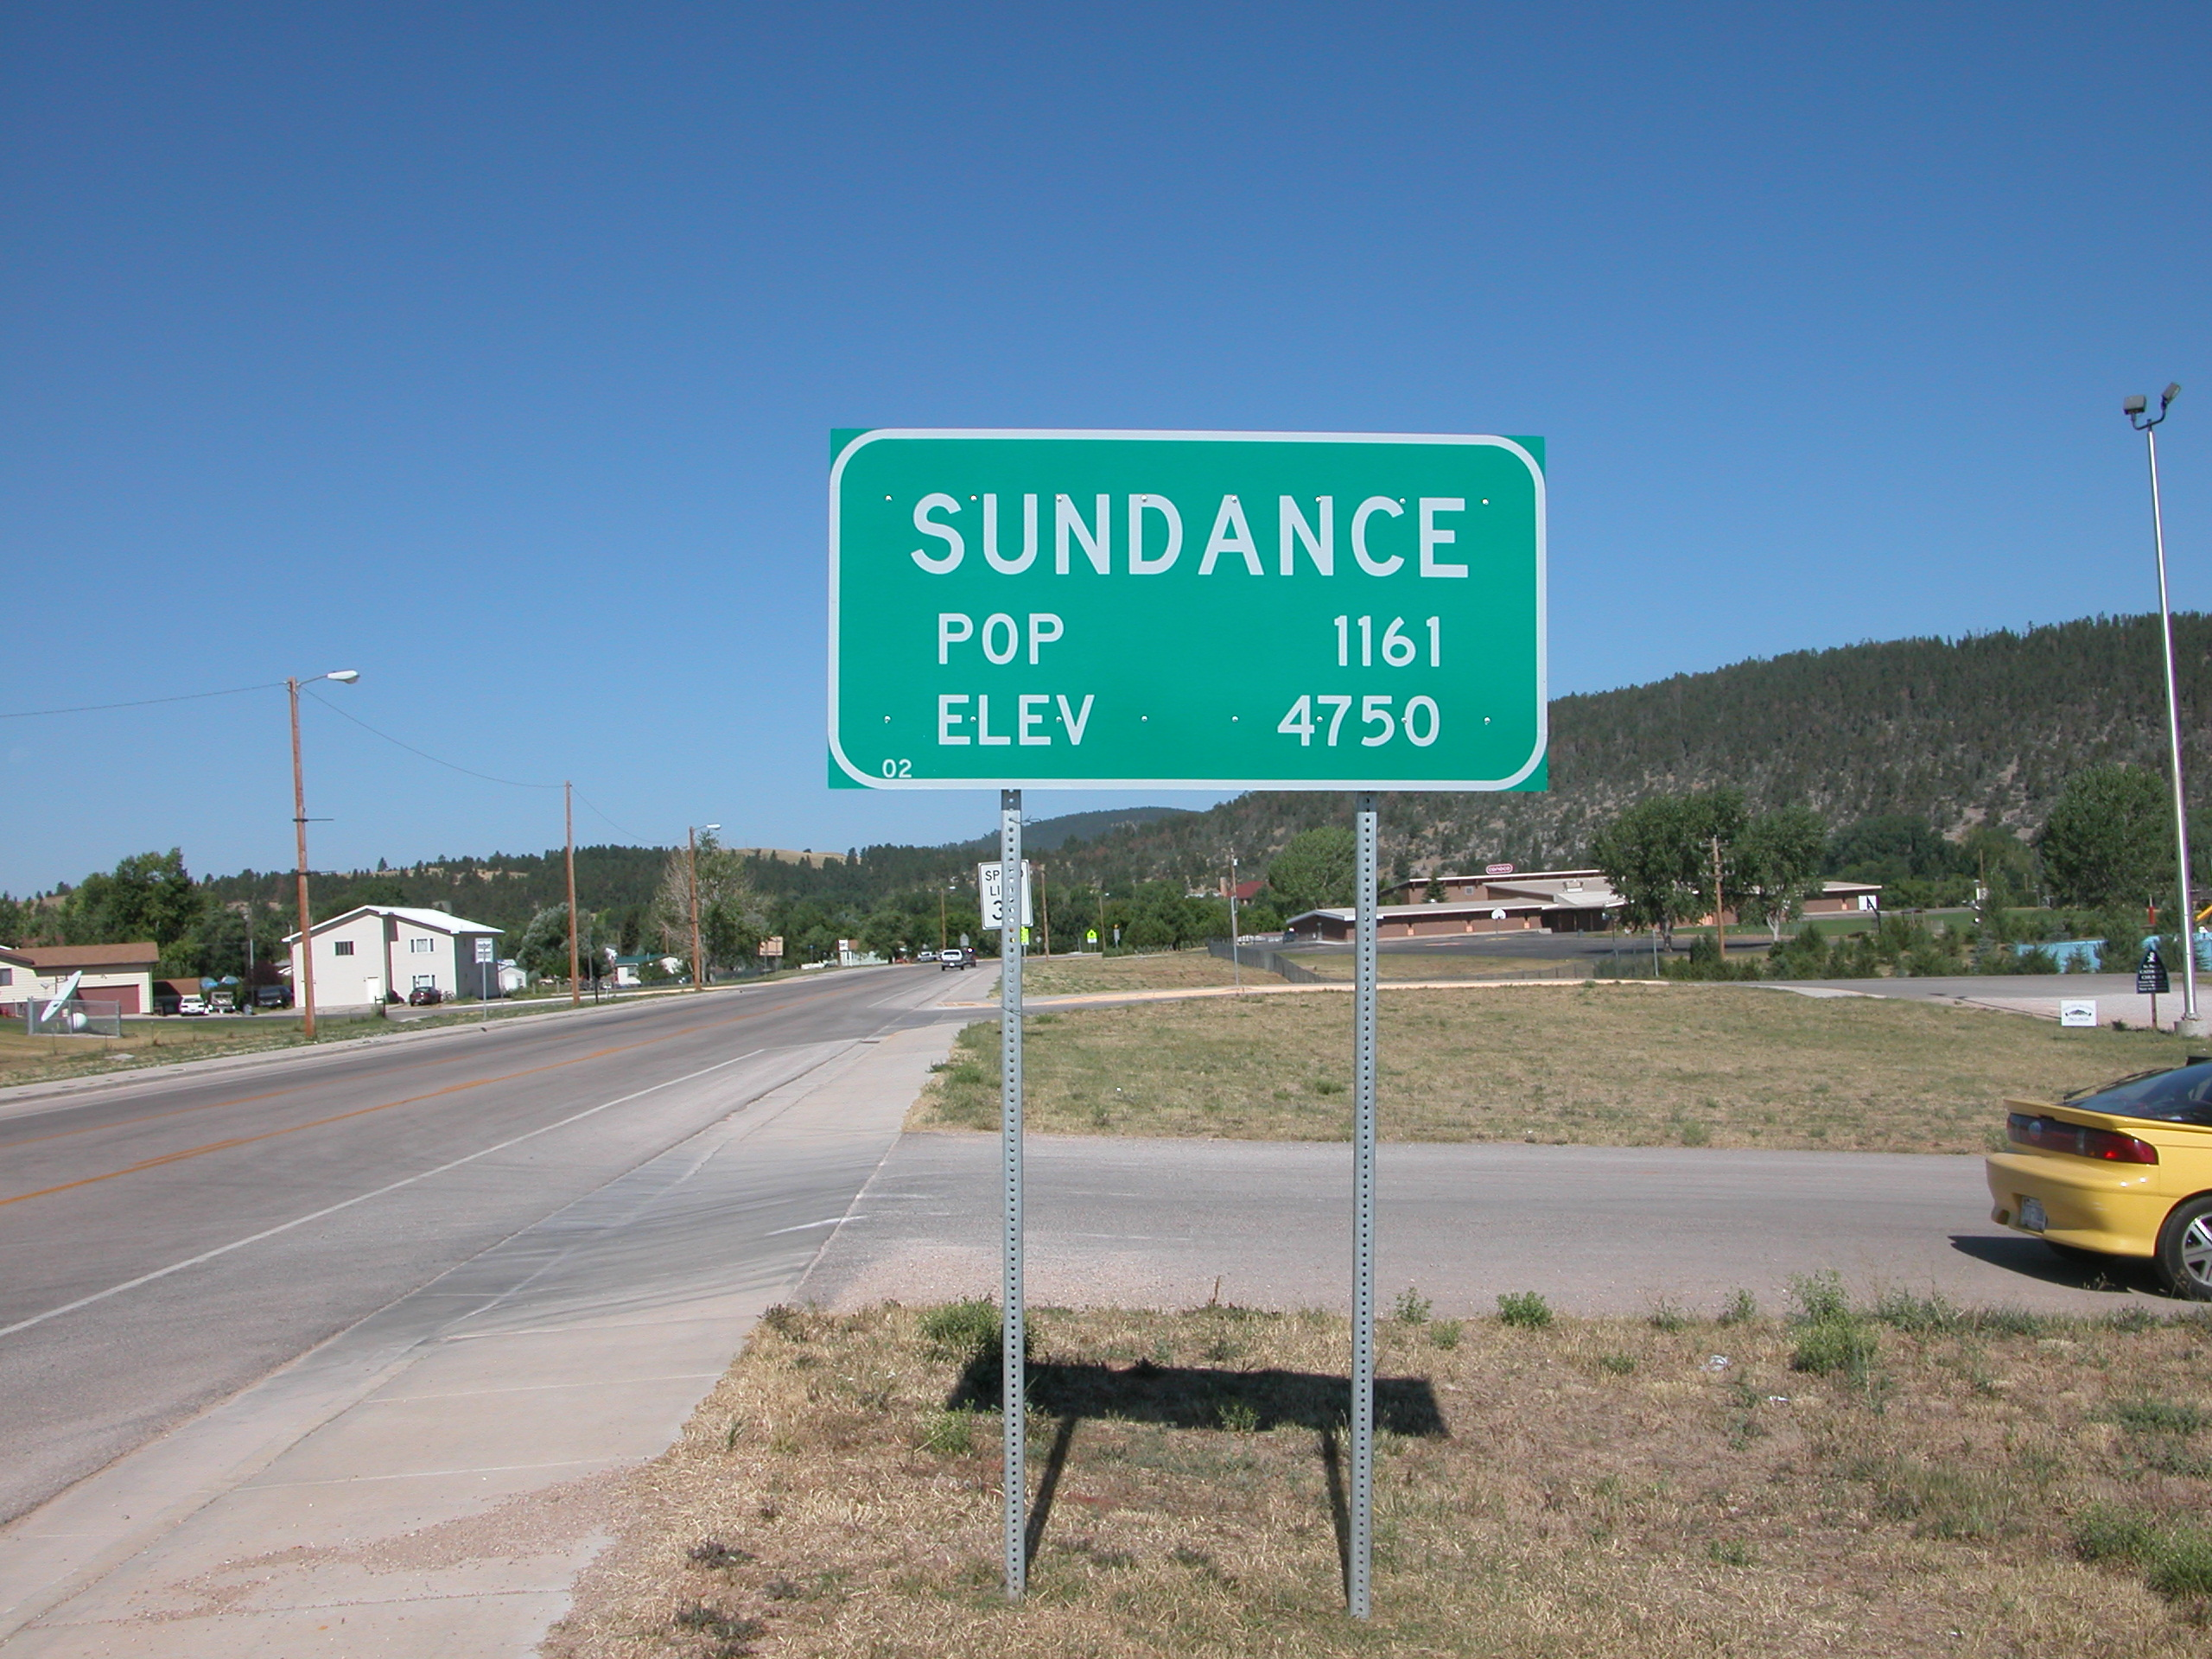 2003-08-16_Sundance,_Wyoming_city_limit_sign.jpg